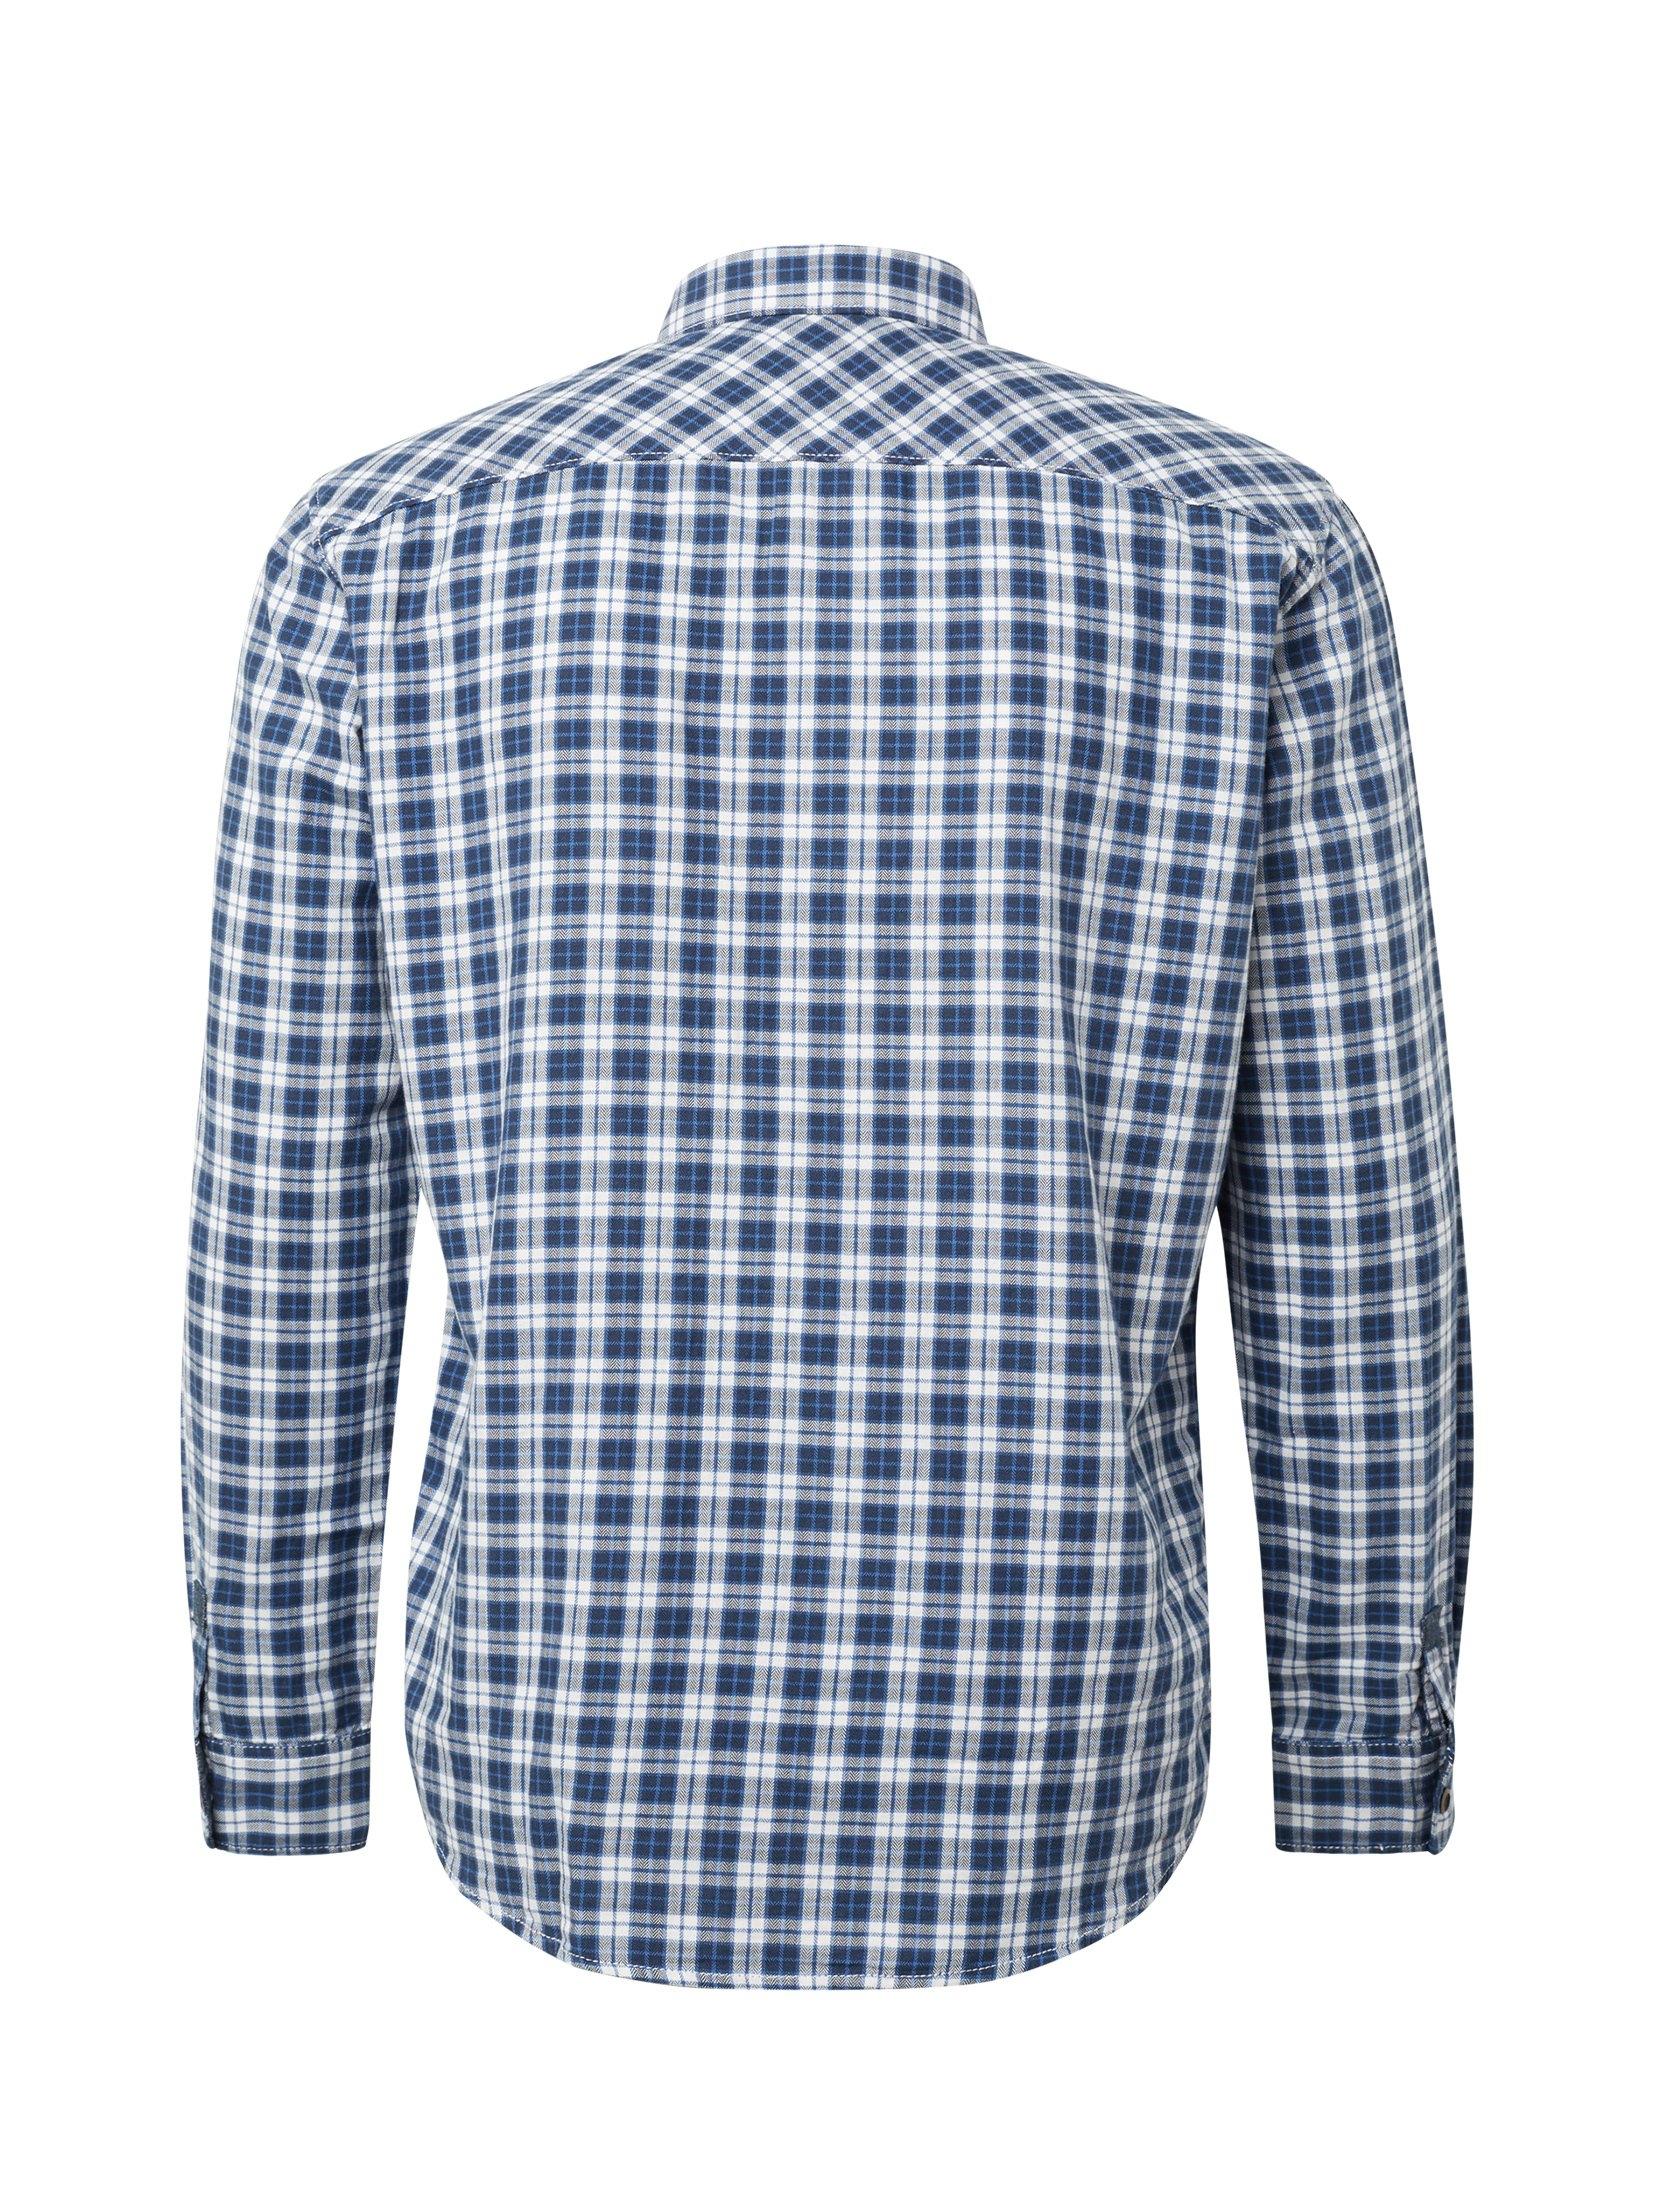 In Tailor De Shop Tom Online Overhemd Overhemdgeruit OkTPXZui